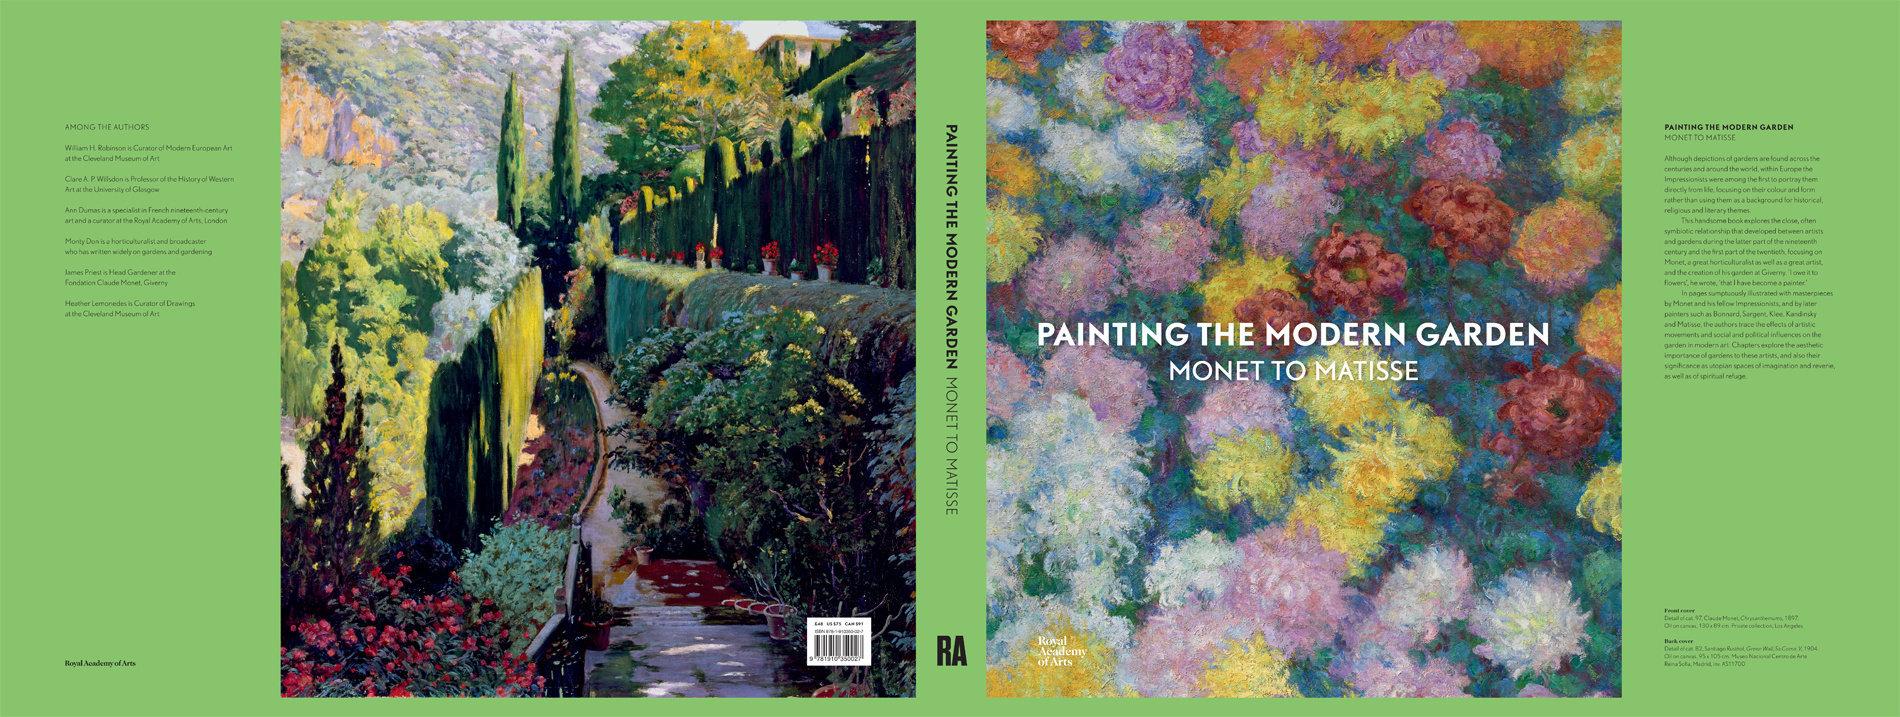 RA Painting The Modern Garden